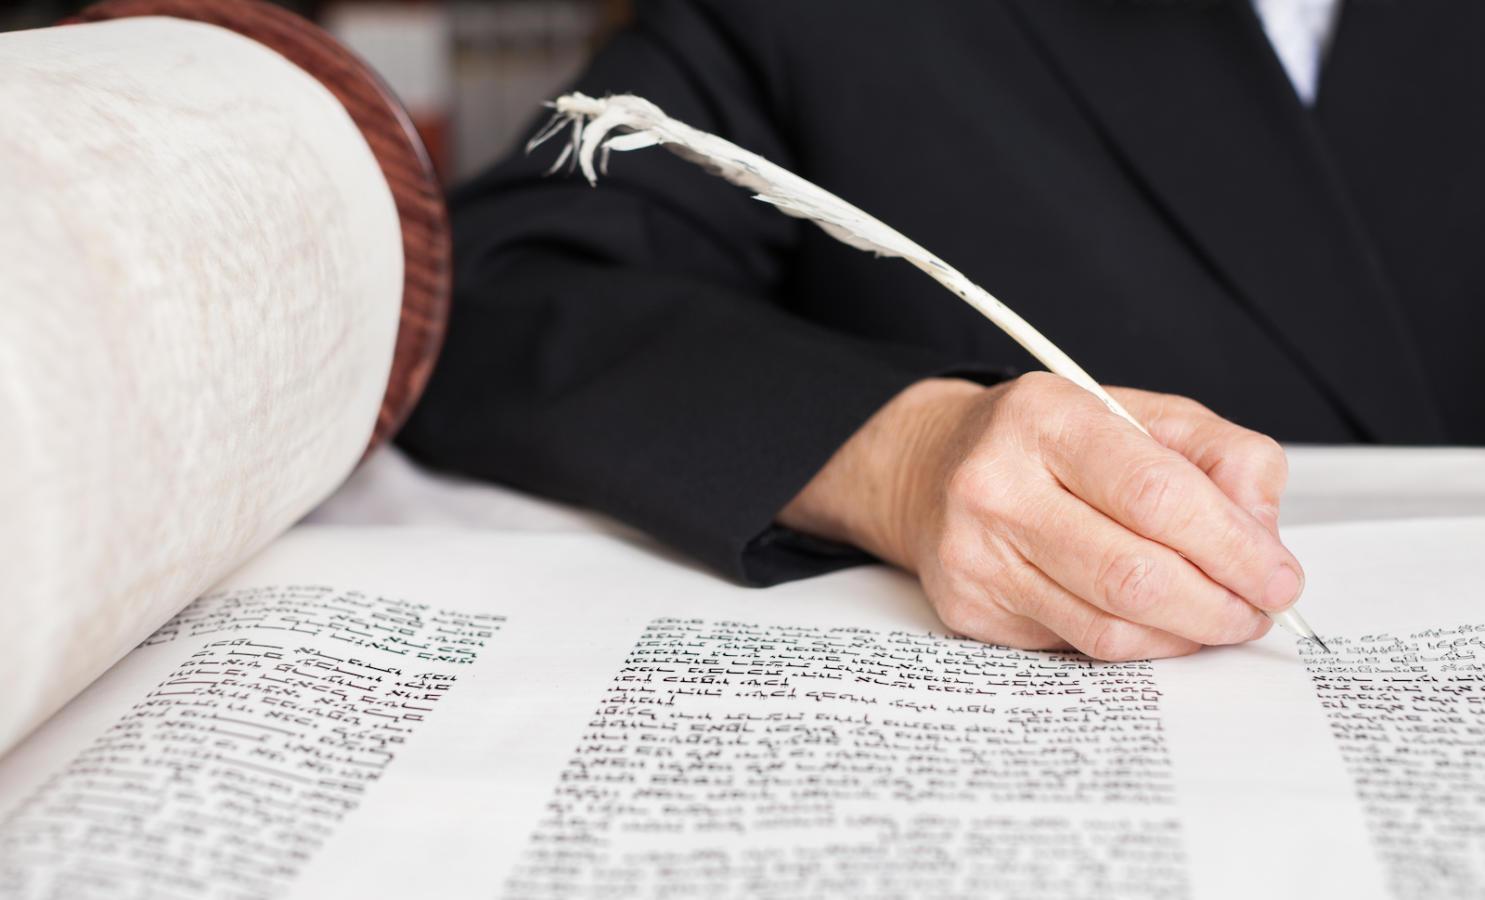 Scribe writing a Torah